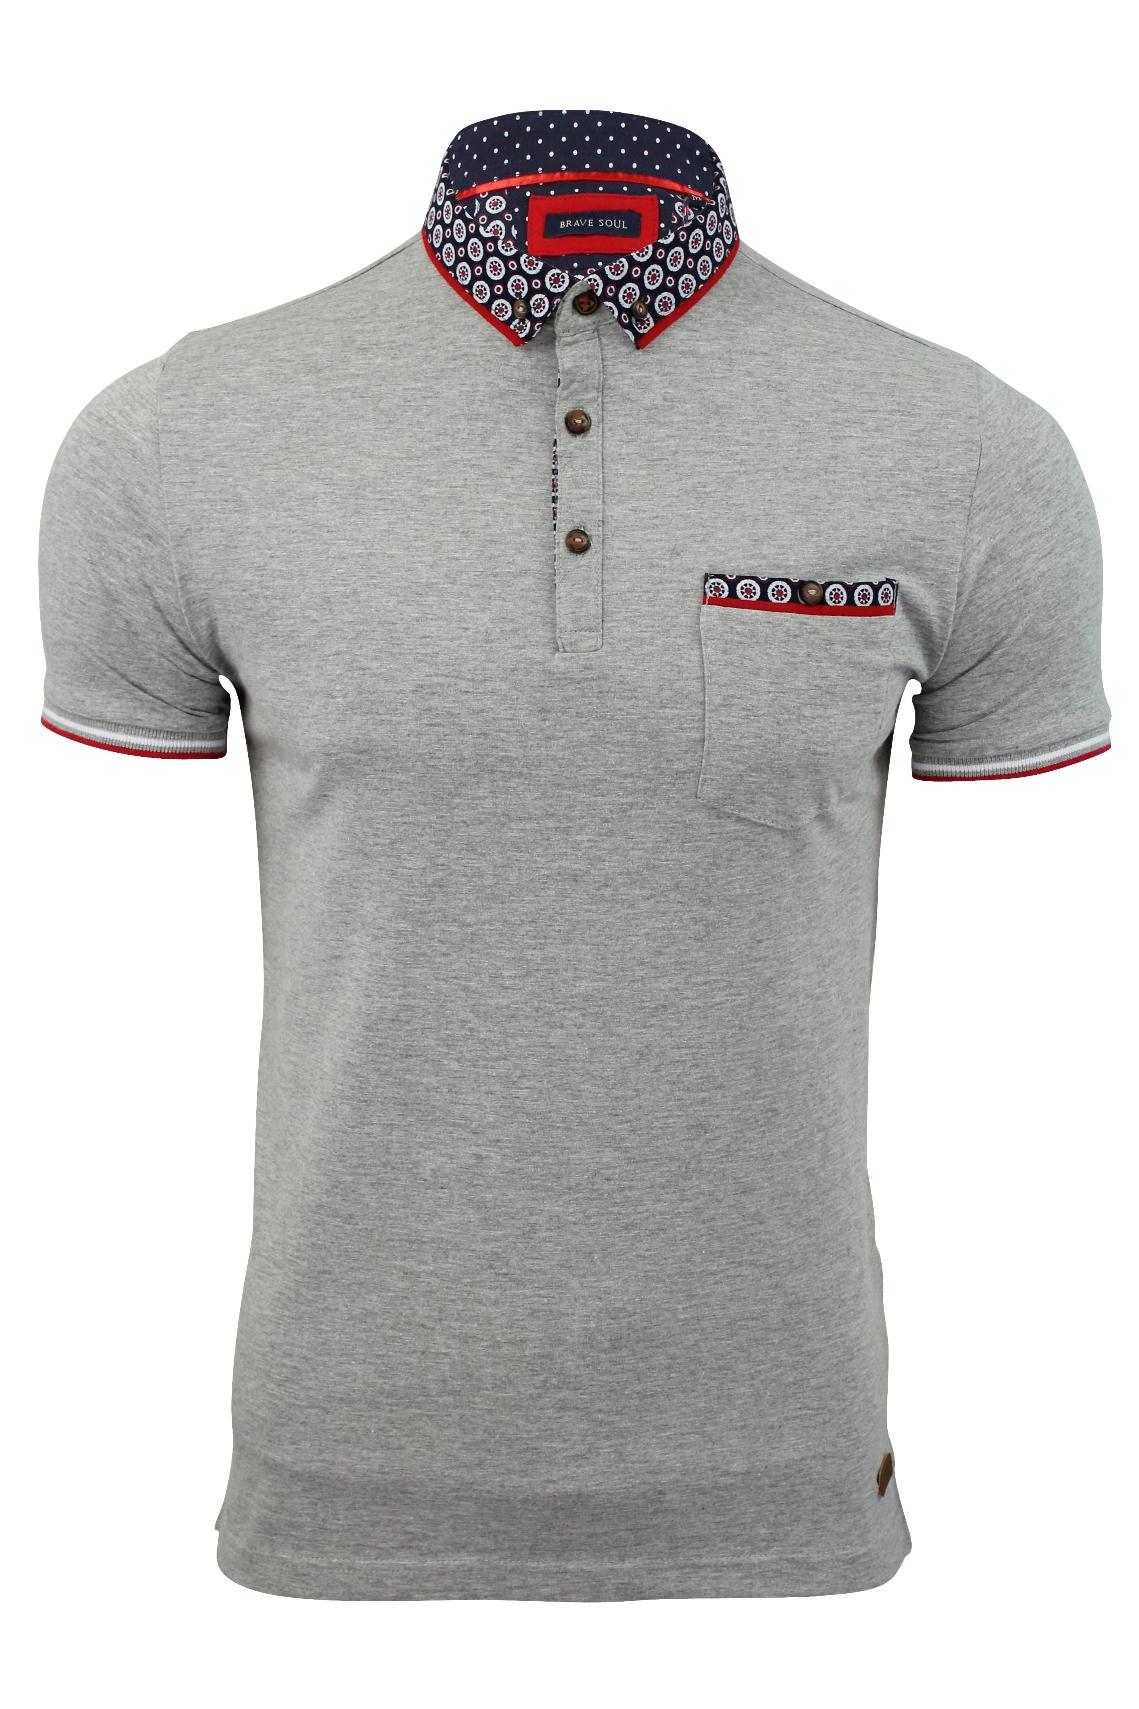 Mens-Polo-T-Shirt-Chimera-Brave-Soul-Denim-Chambray-Collar-Short-Sleeved-Cotton thumbnail 38